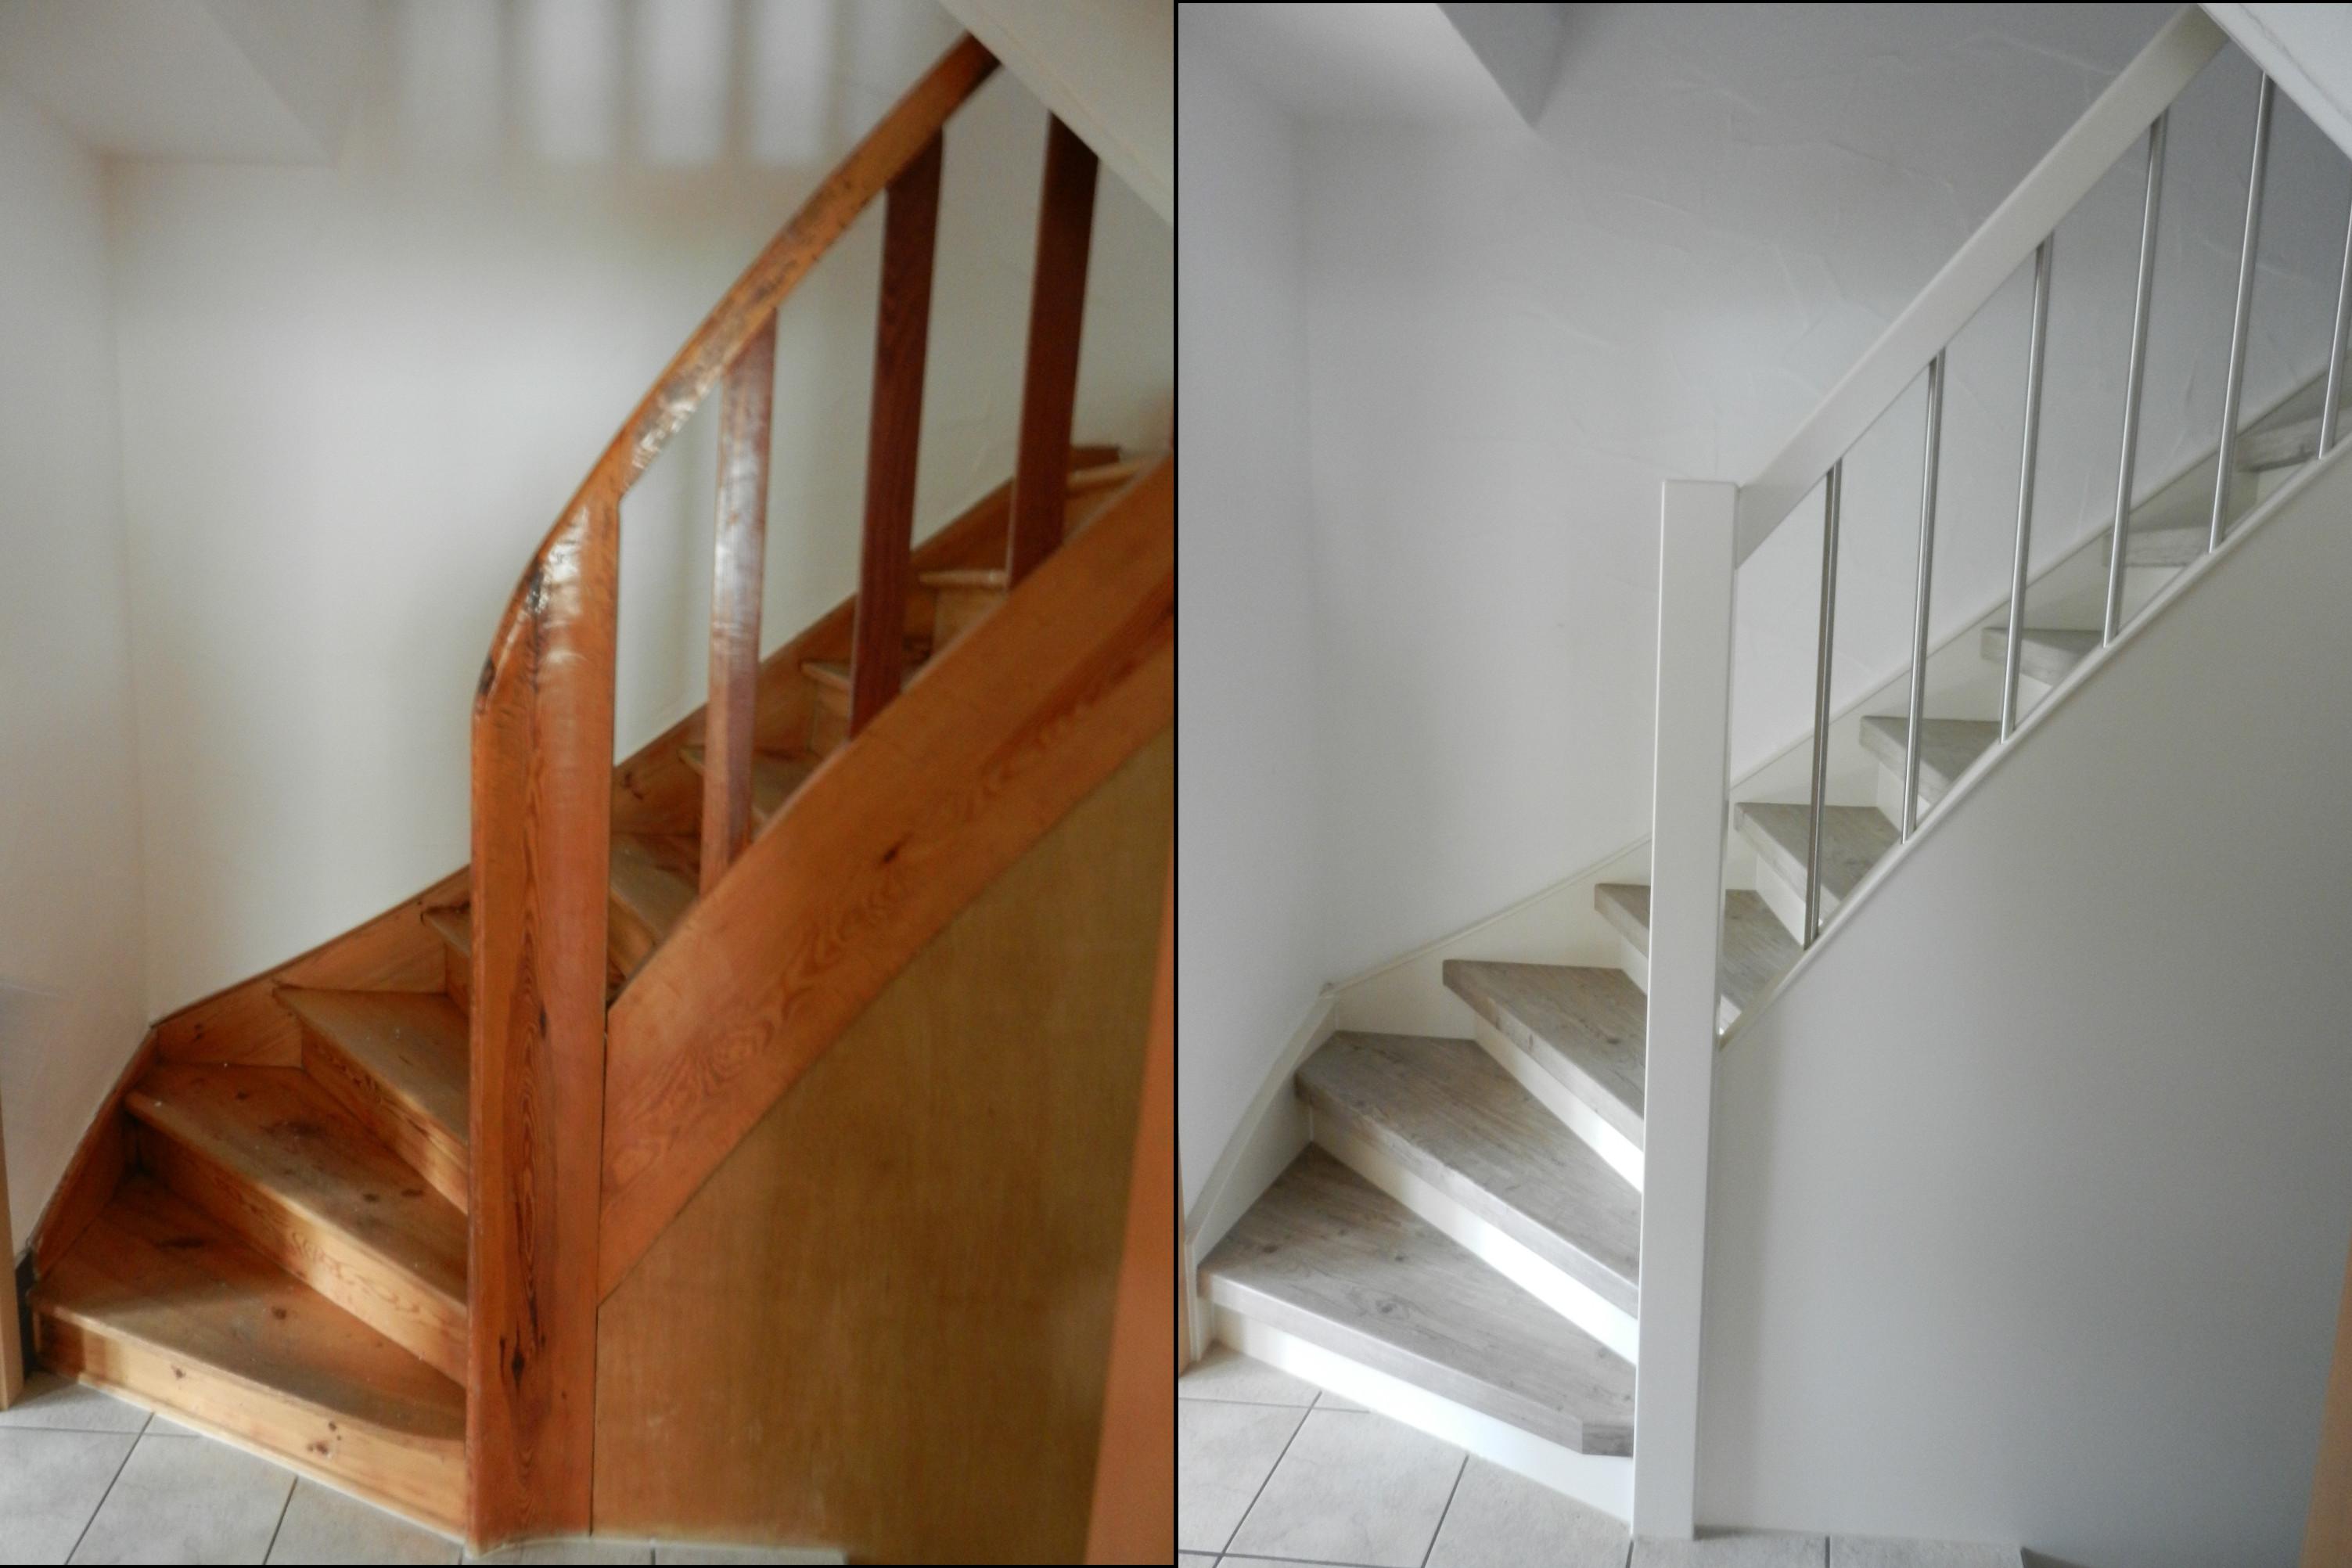 treppe mit laminat verkleiden latest koline massivholz treppe in eiche with treppe mit laminat. Black Bedroom Furniture Sets. Home Design Ideas